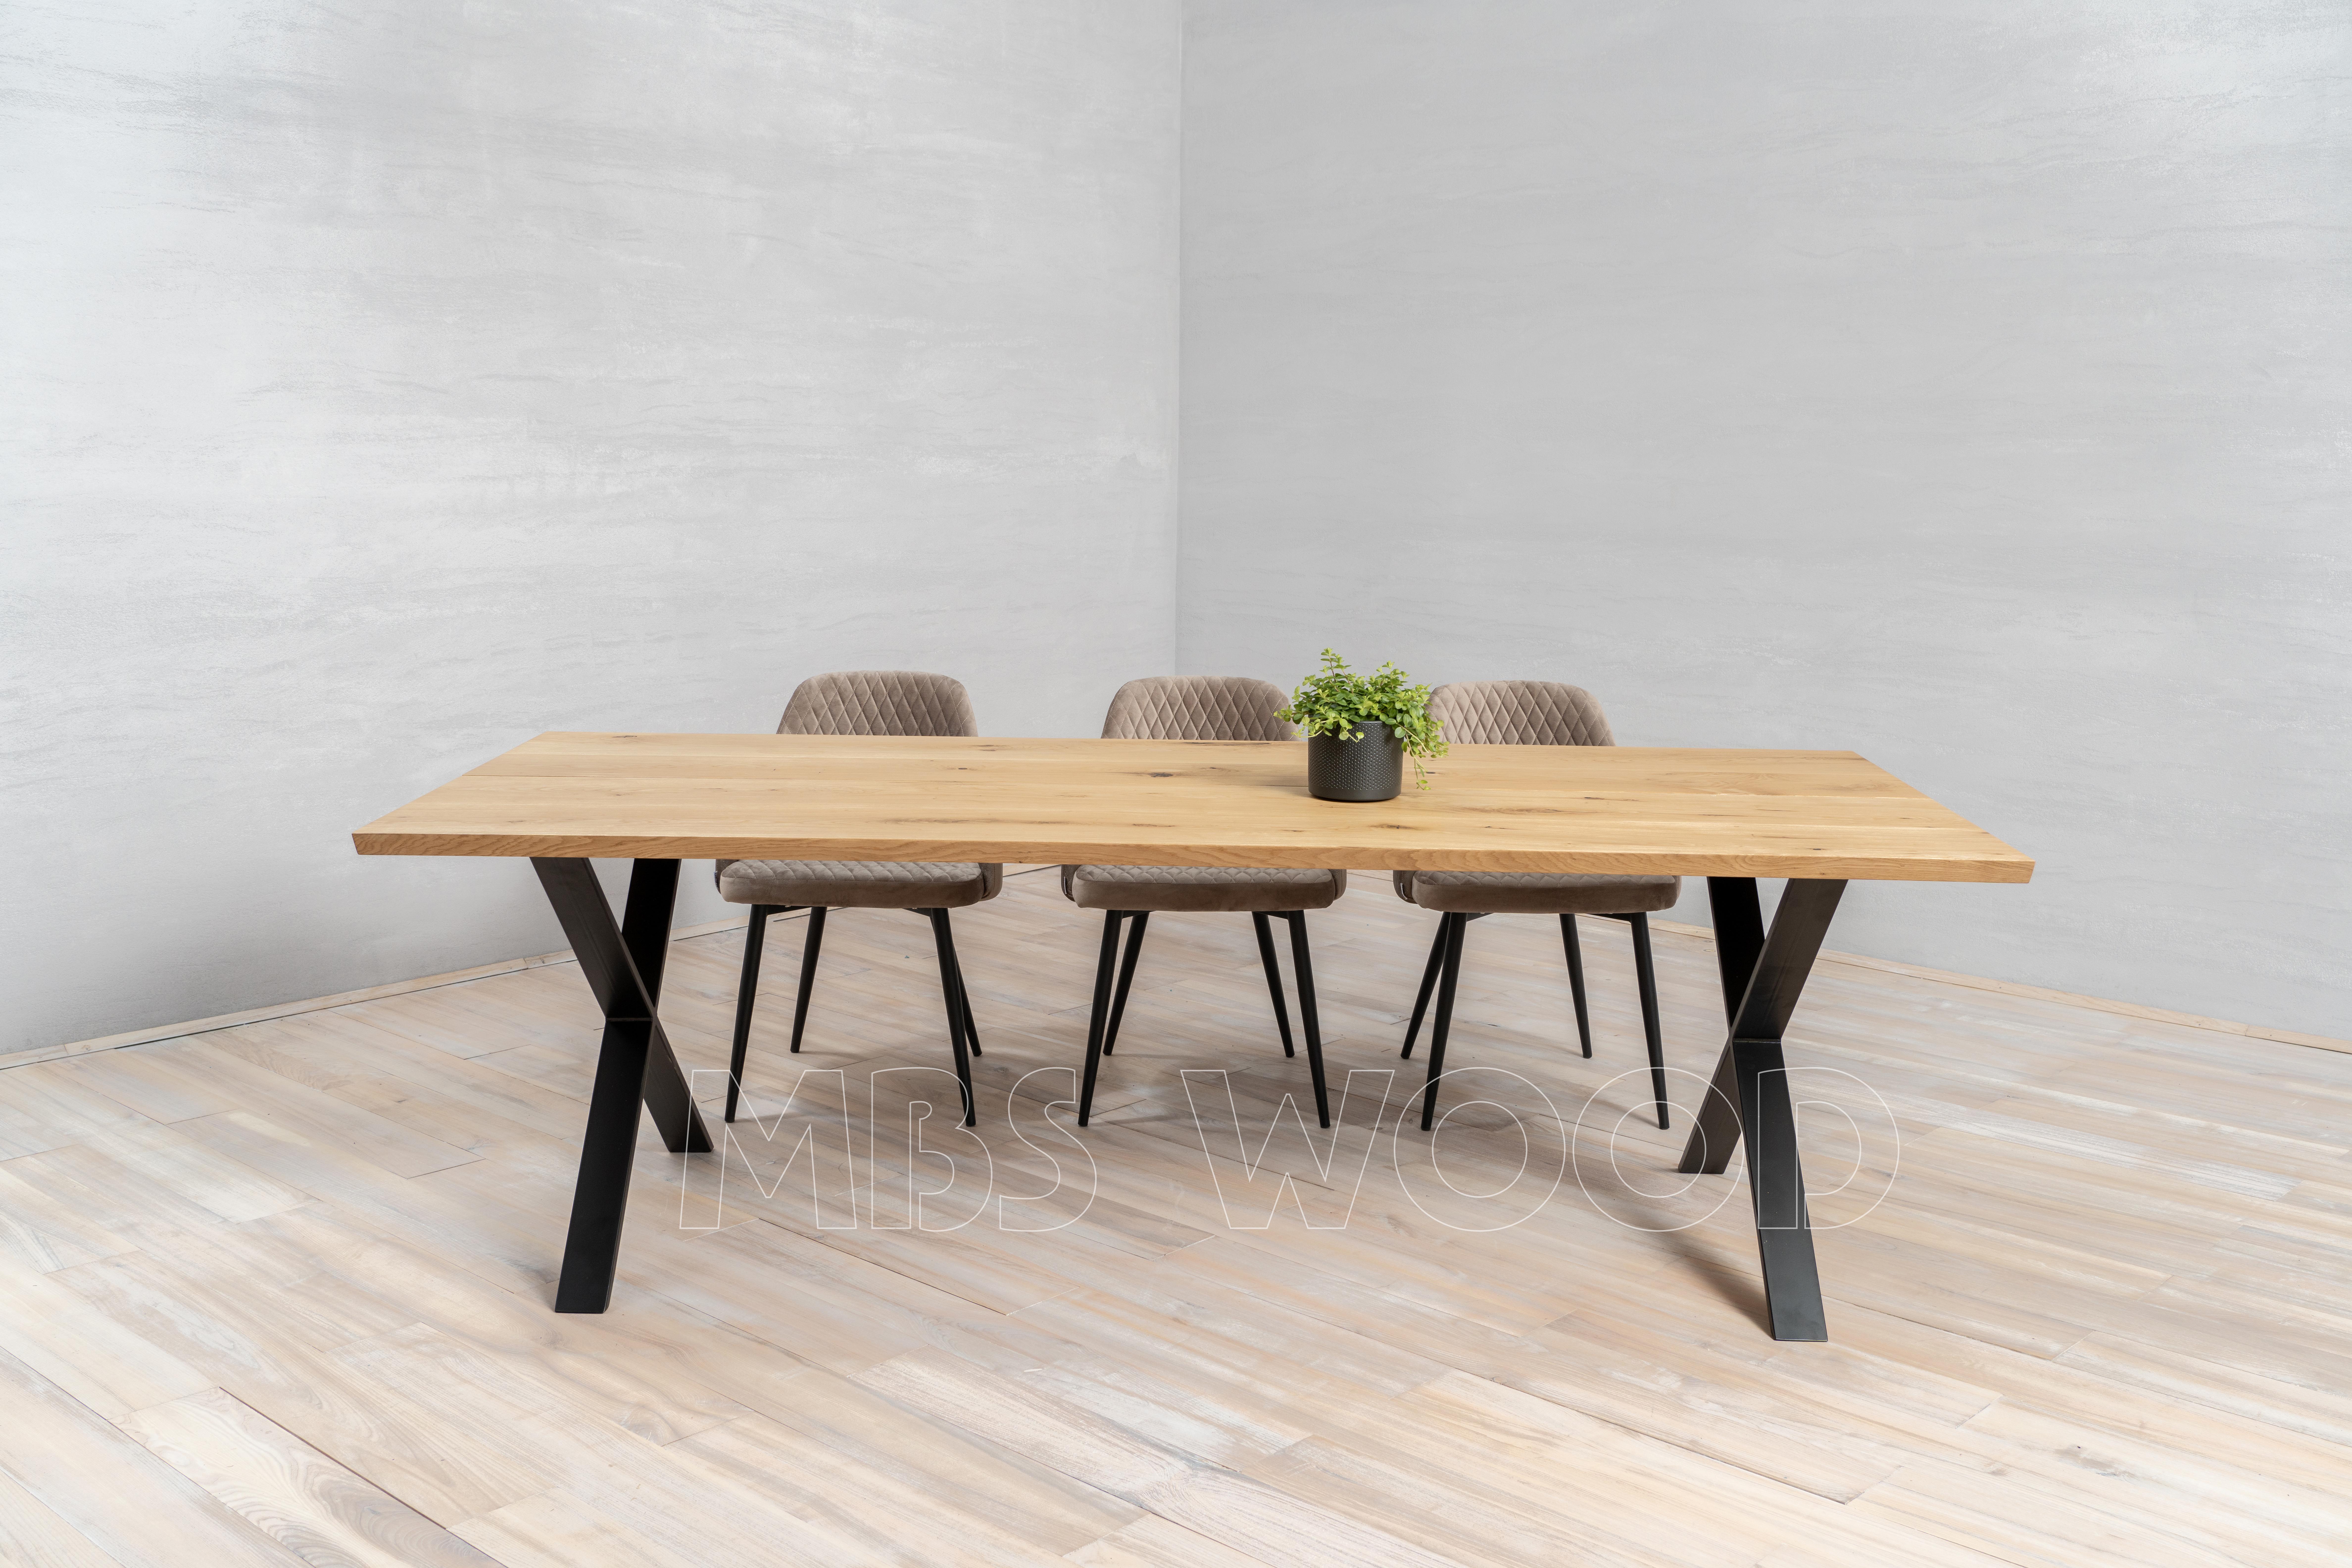 Oak tables mbswood.com with metal legs x-shape color black